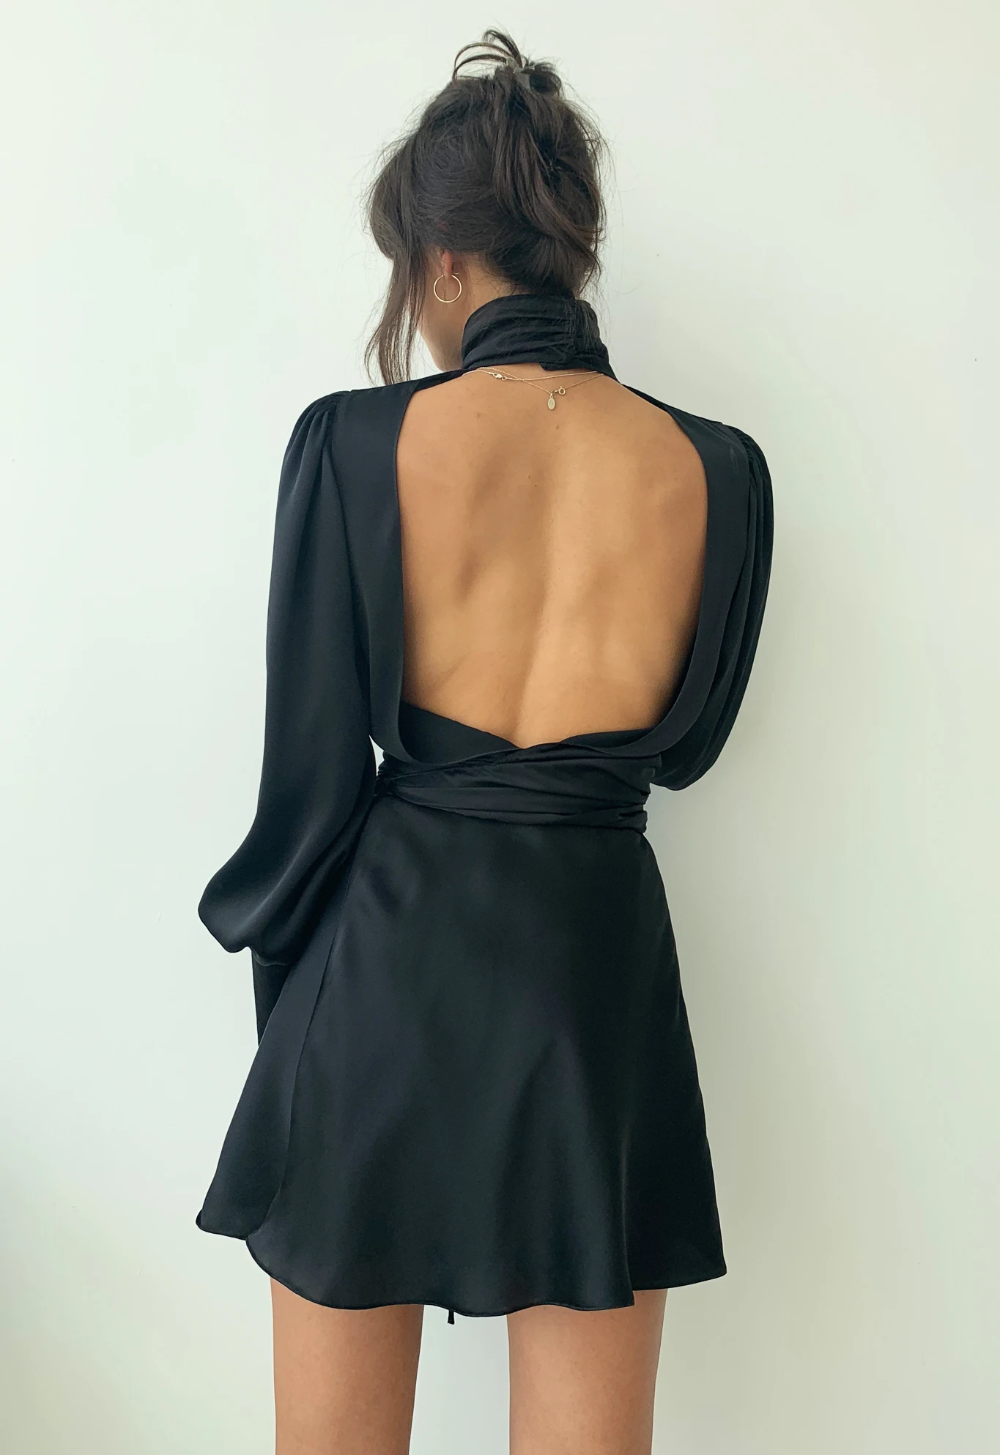 Night Out Dress Black In 2021 Night Out Dress Fashion Black Women Fashion [ 1455 x 1000 Pixel ]